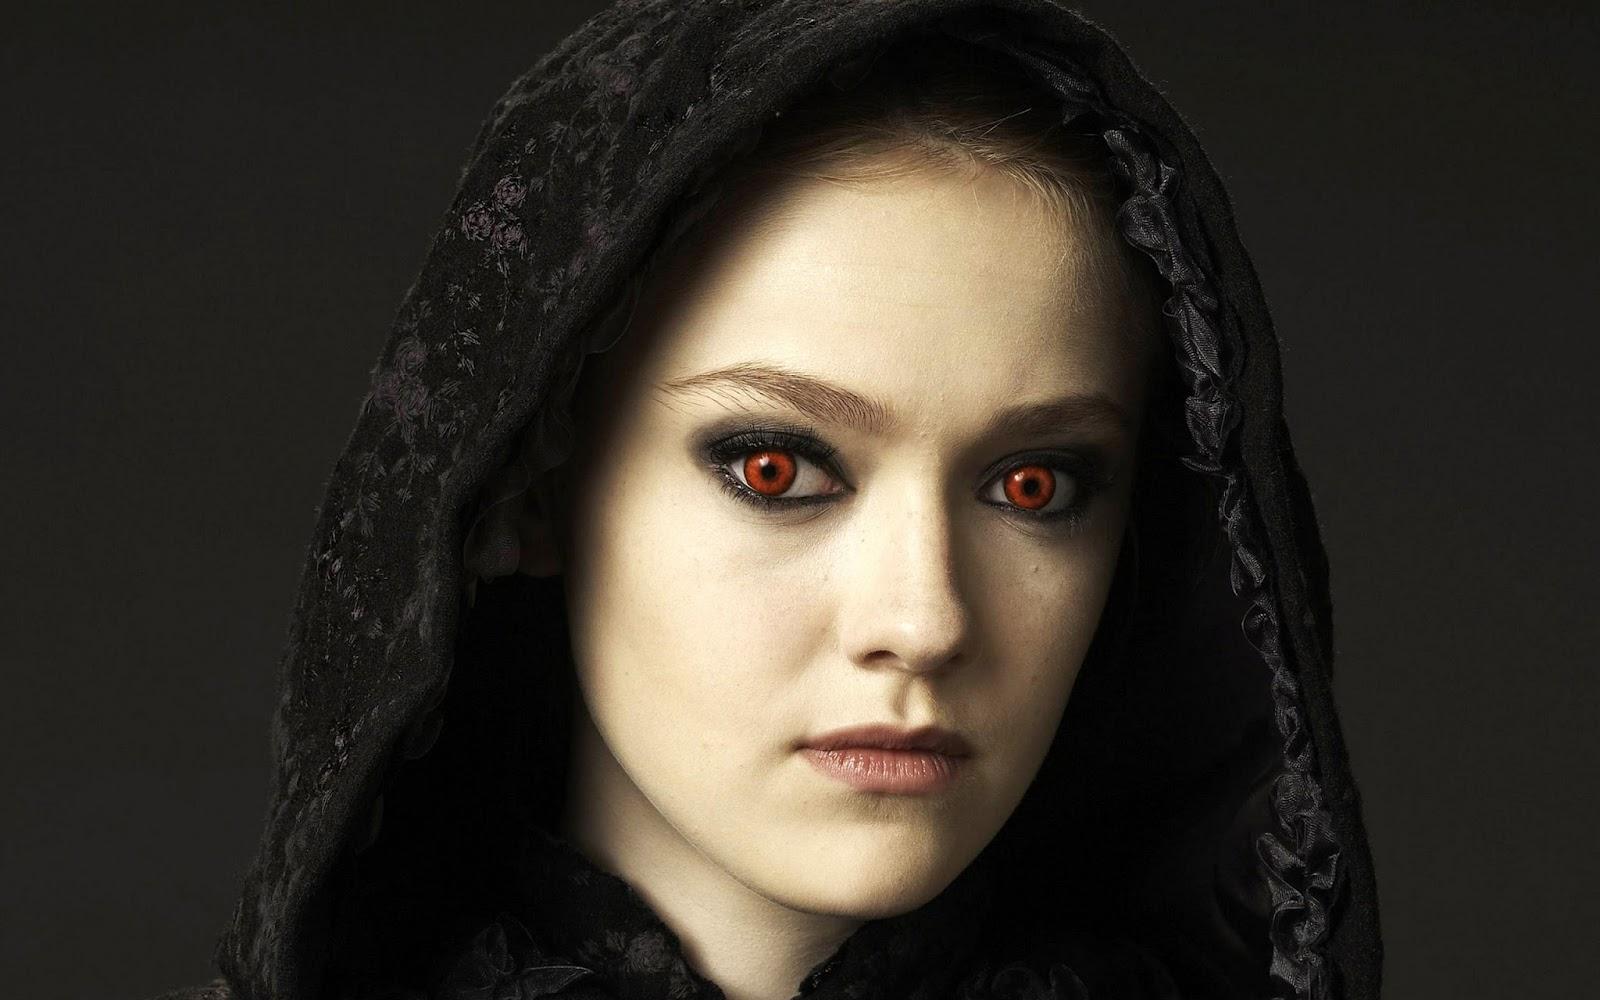 GallianMachi: Dakota Fanning as Jane Volturi in Twilight